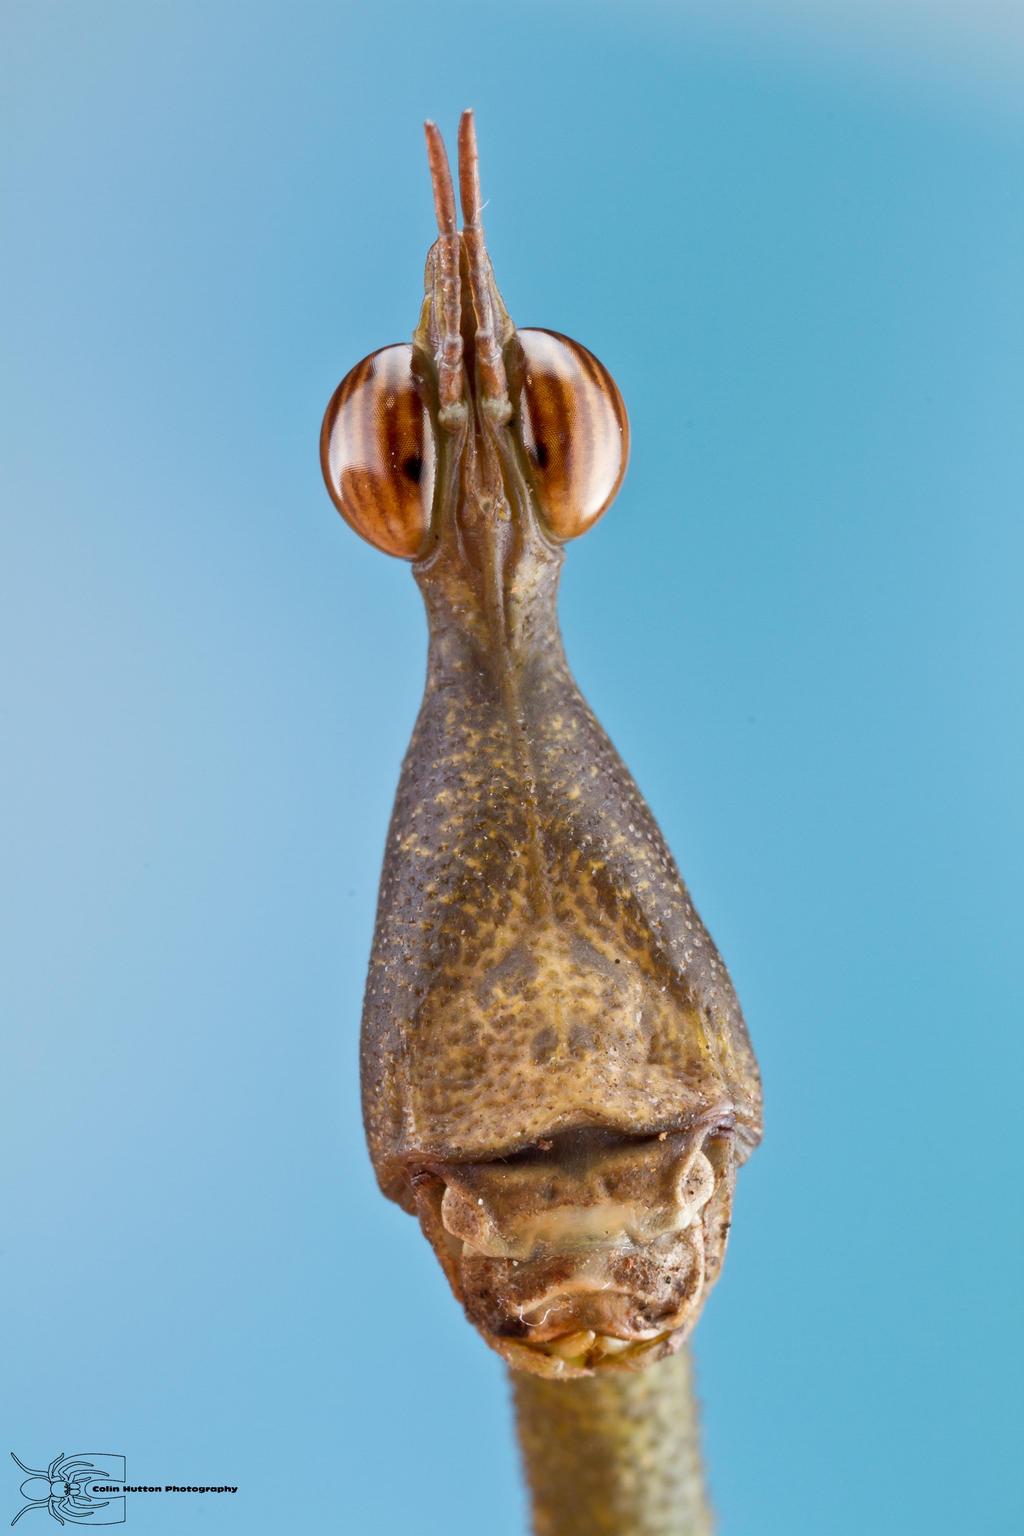 Stick Grasshopper - Proscopidae